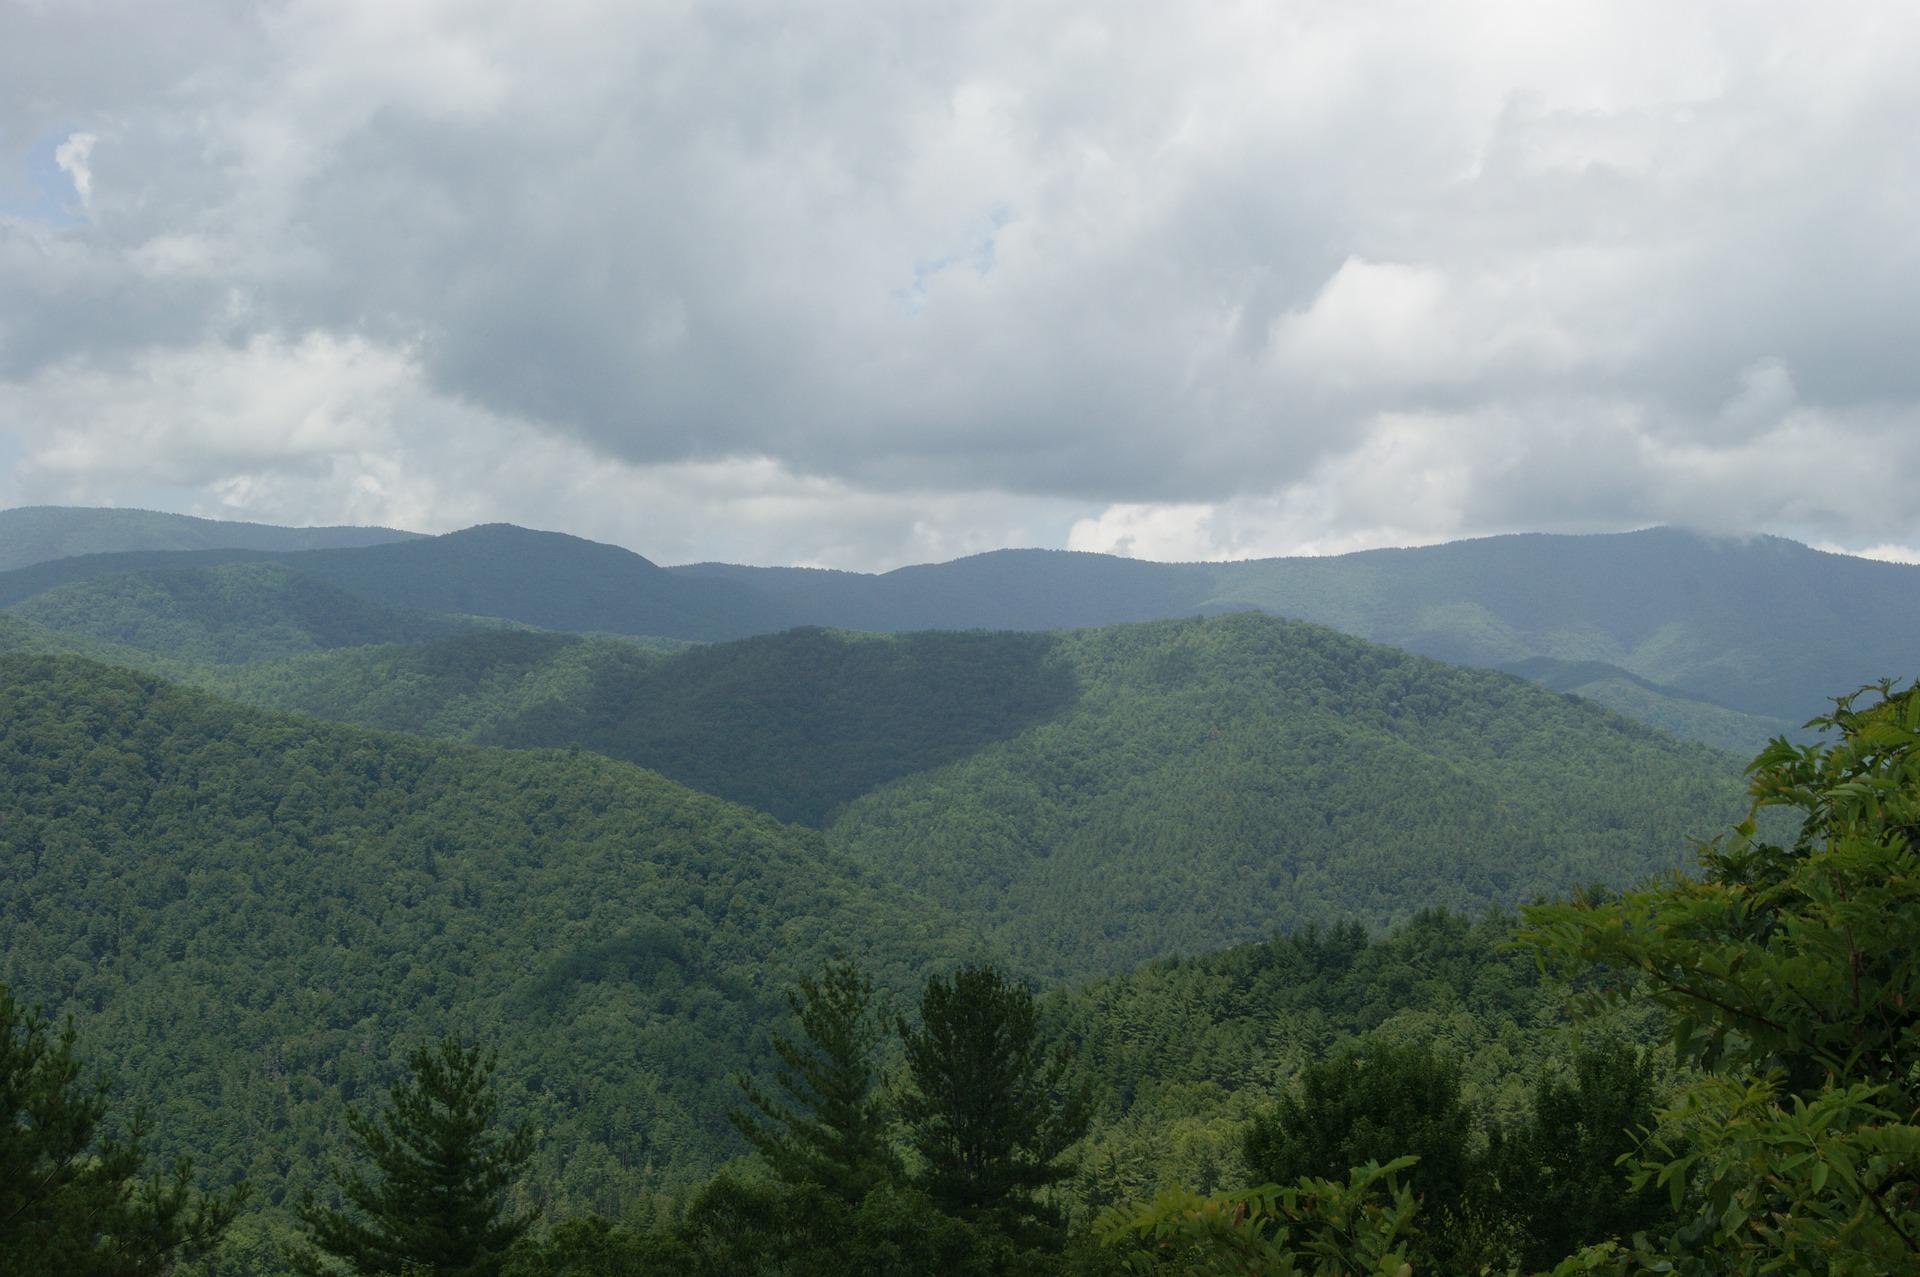 mountains-1754441_1920.jpg